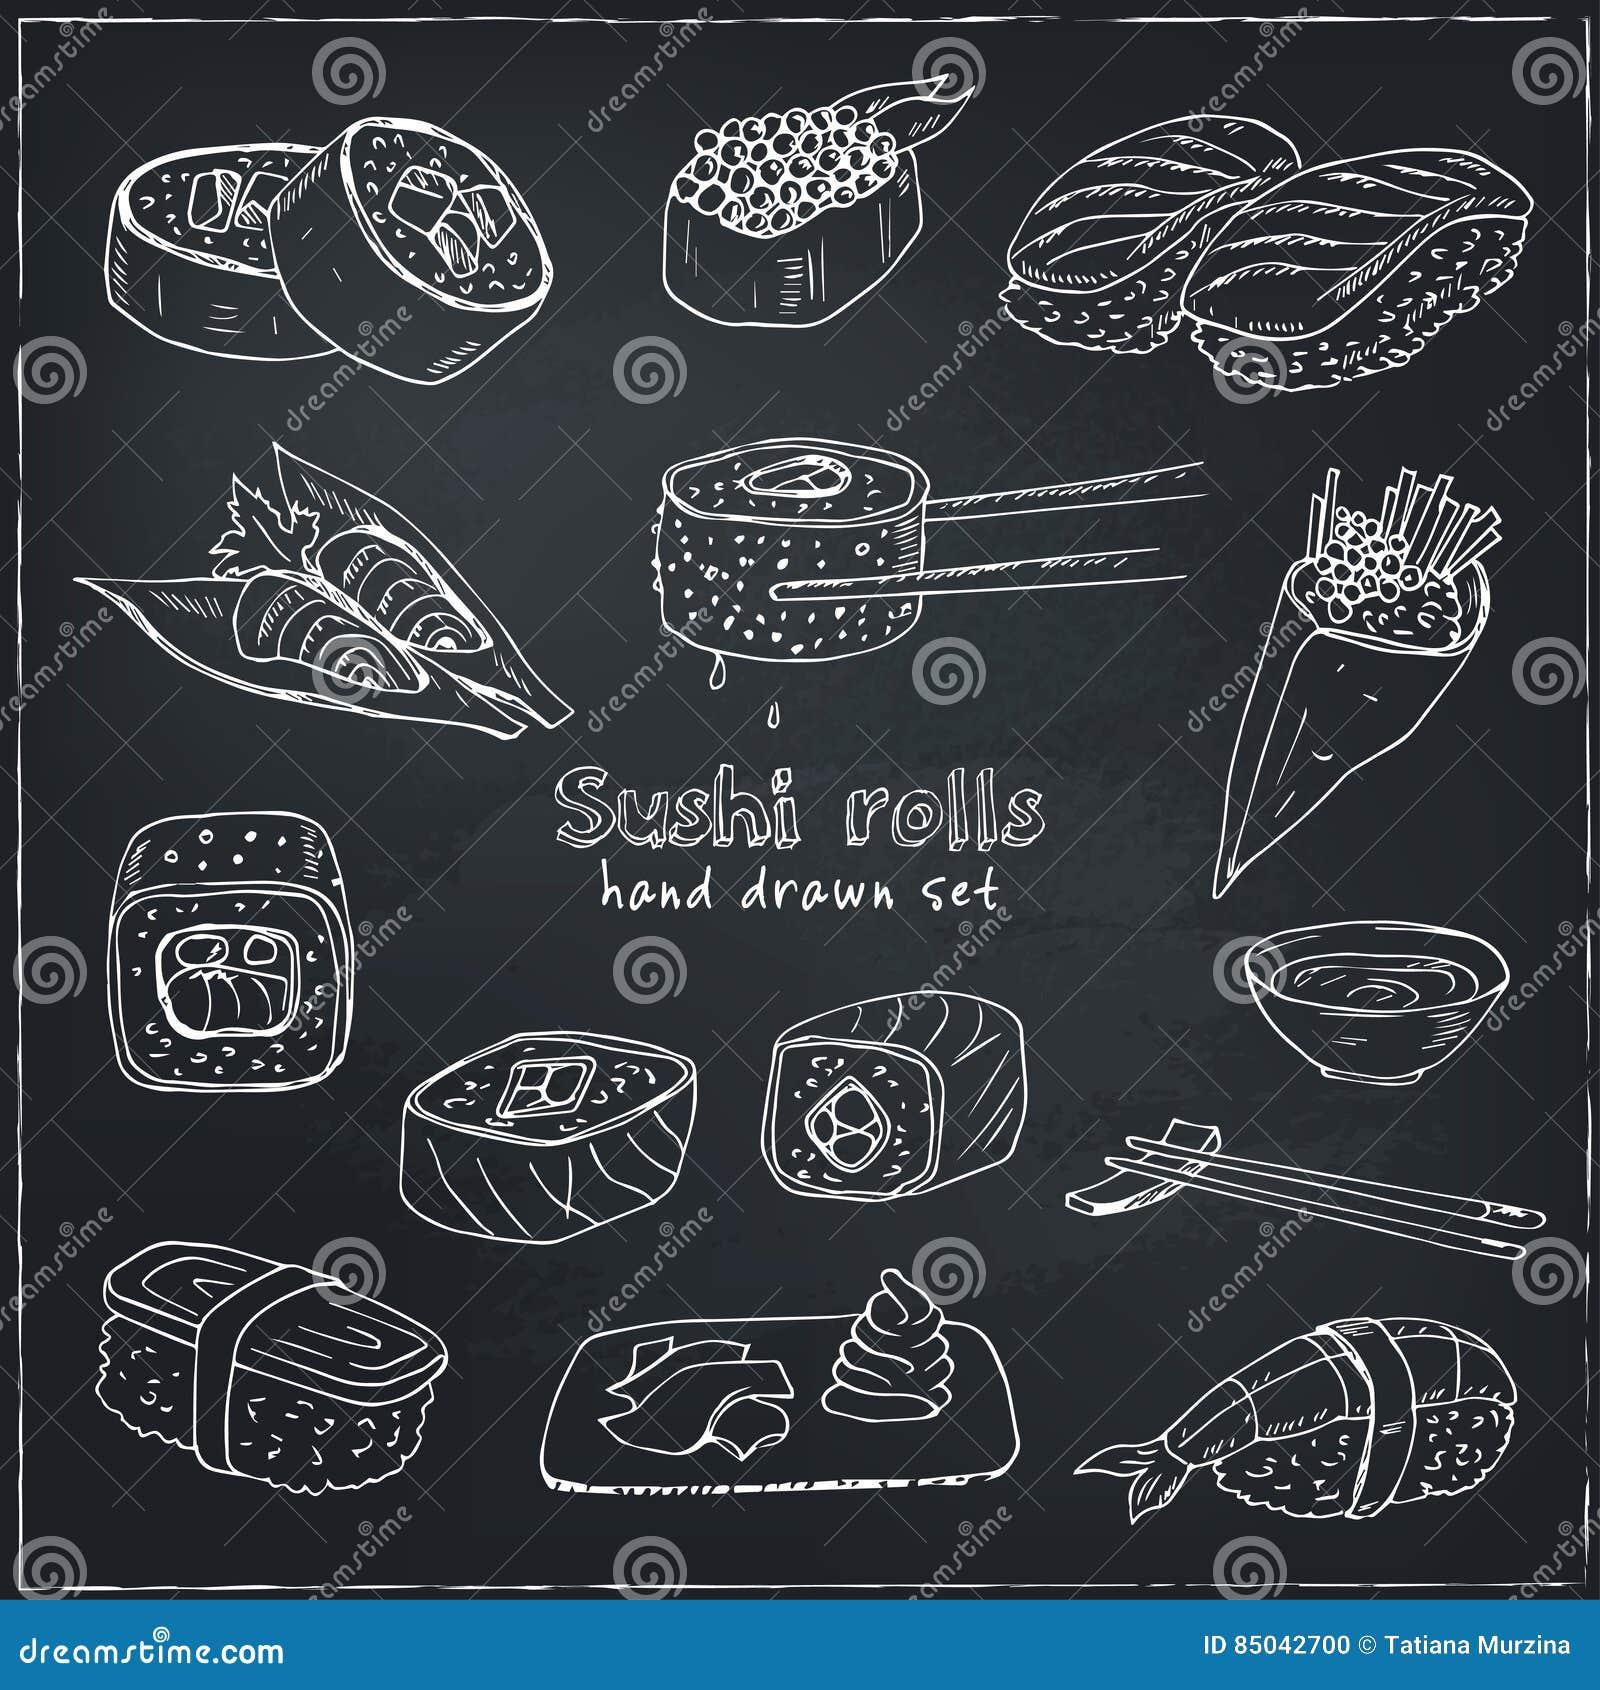 Japanese seafood sushi rolls with salmon, smoked eel, selective food vector.